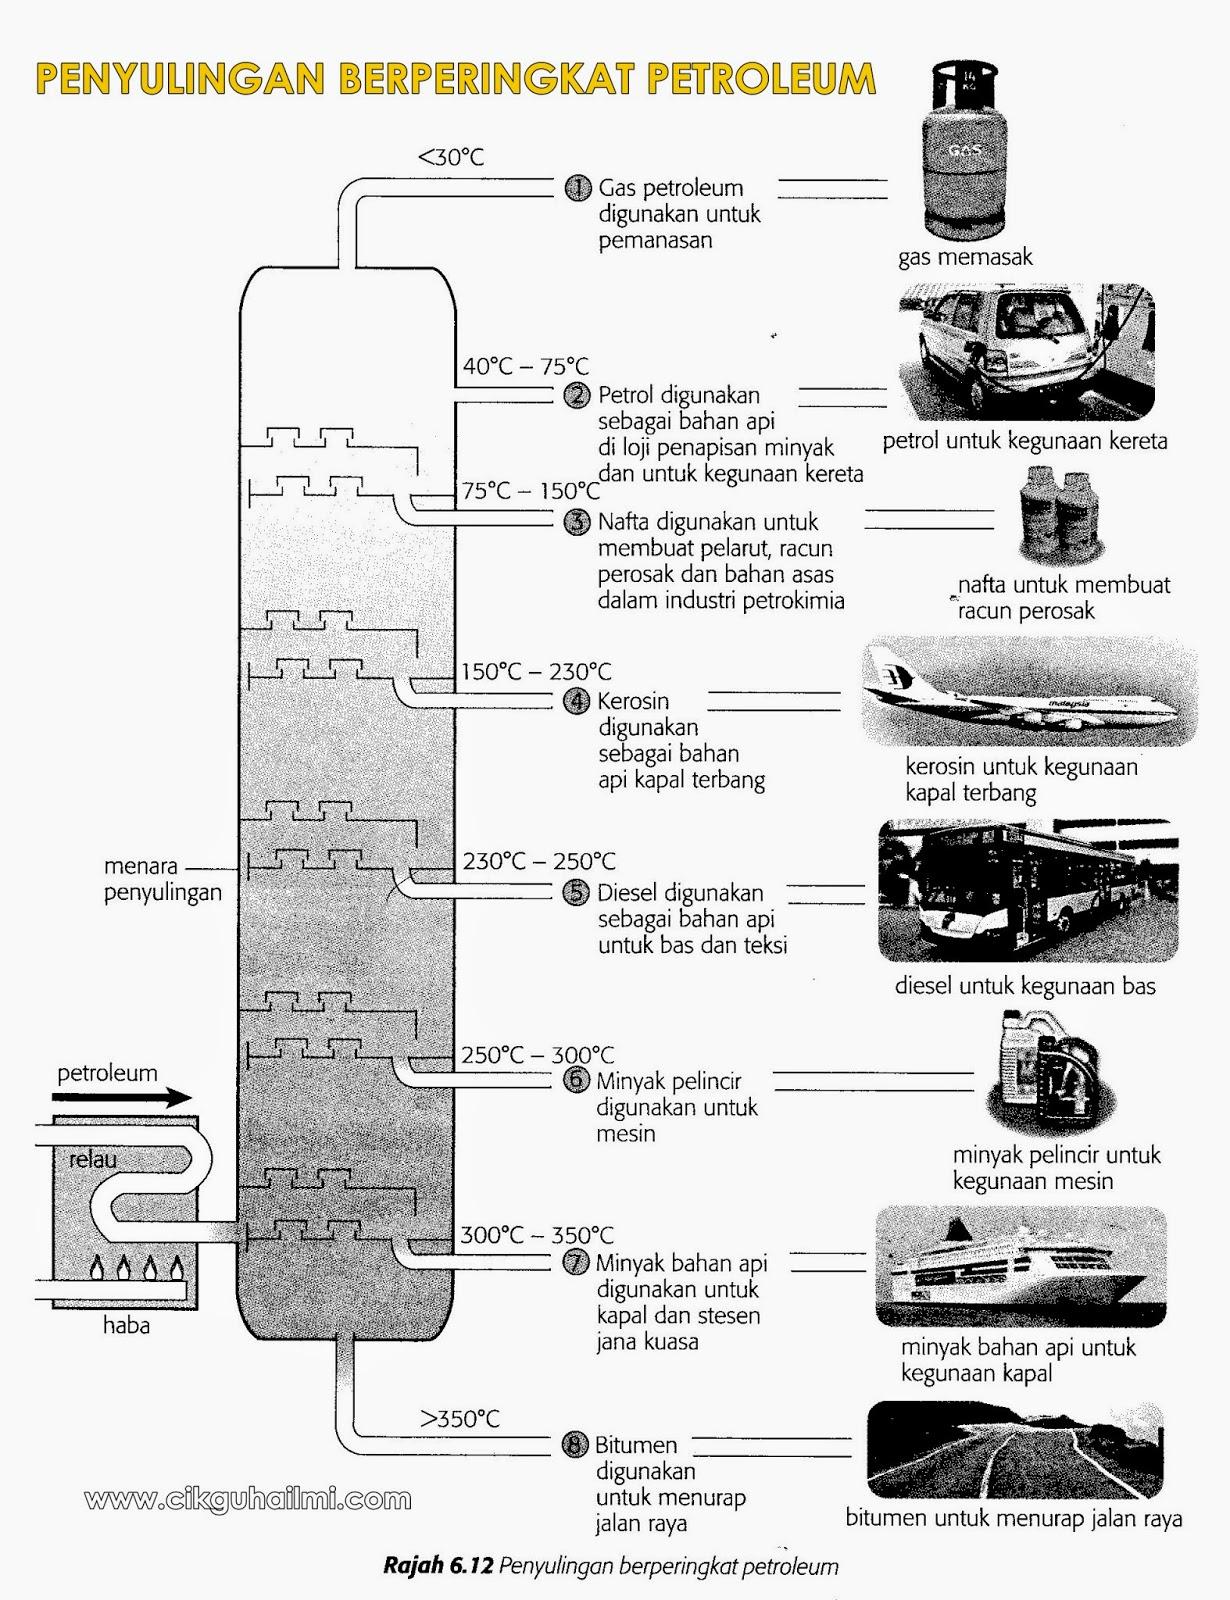 Penyulingan berperingkat petroleum